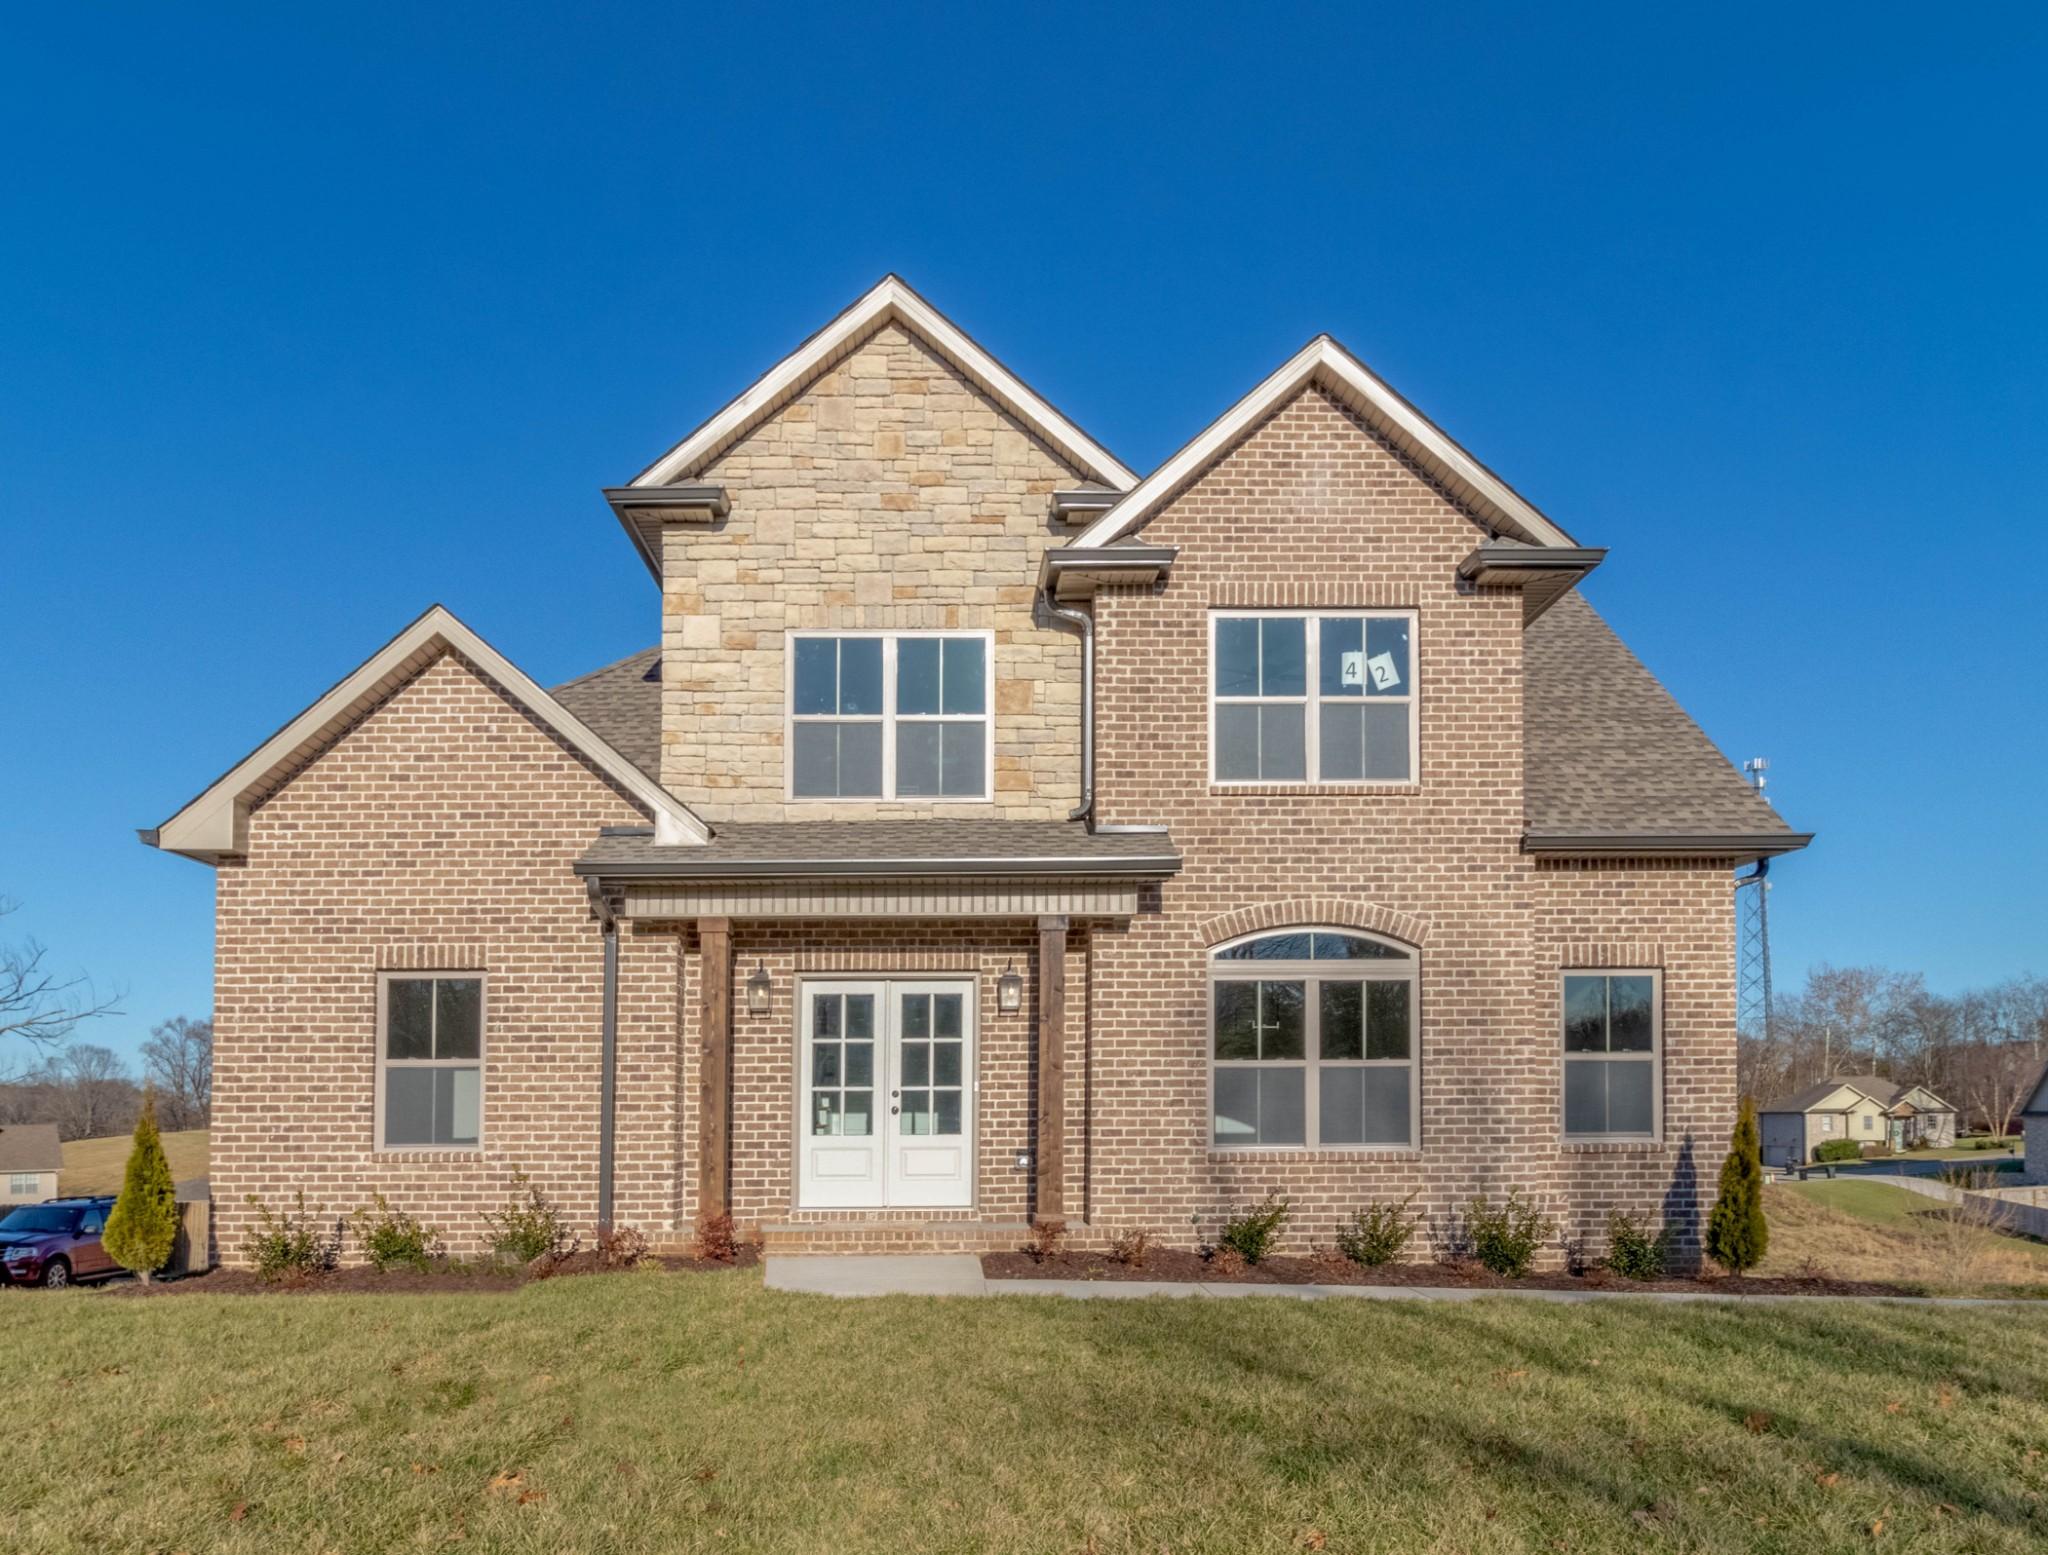 42 Prestwicke Place, Adams, TN 37010 - Adams, TN real estate listing